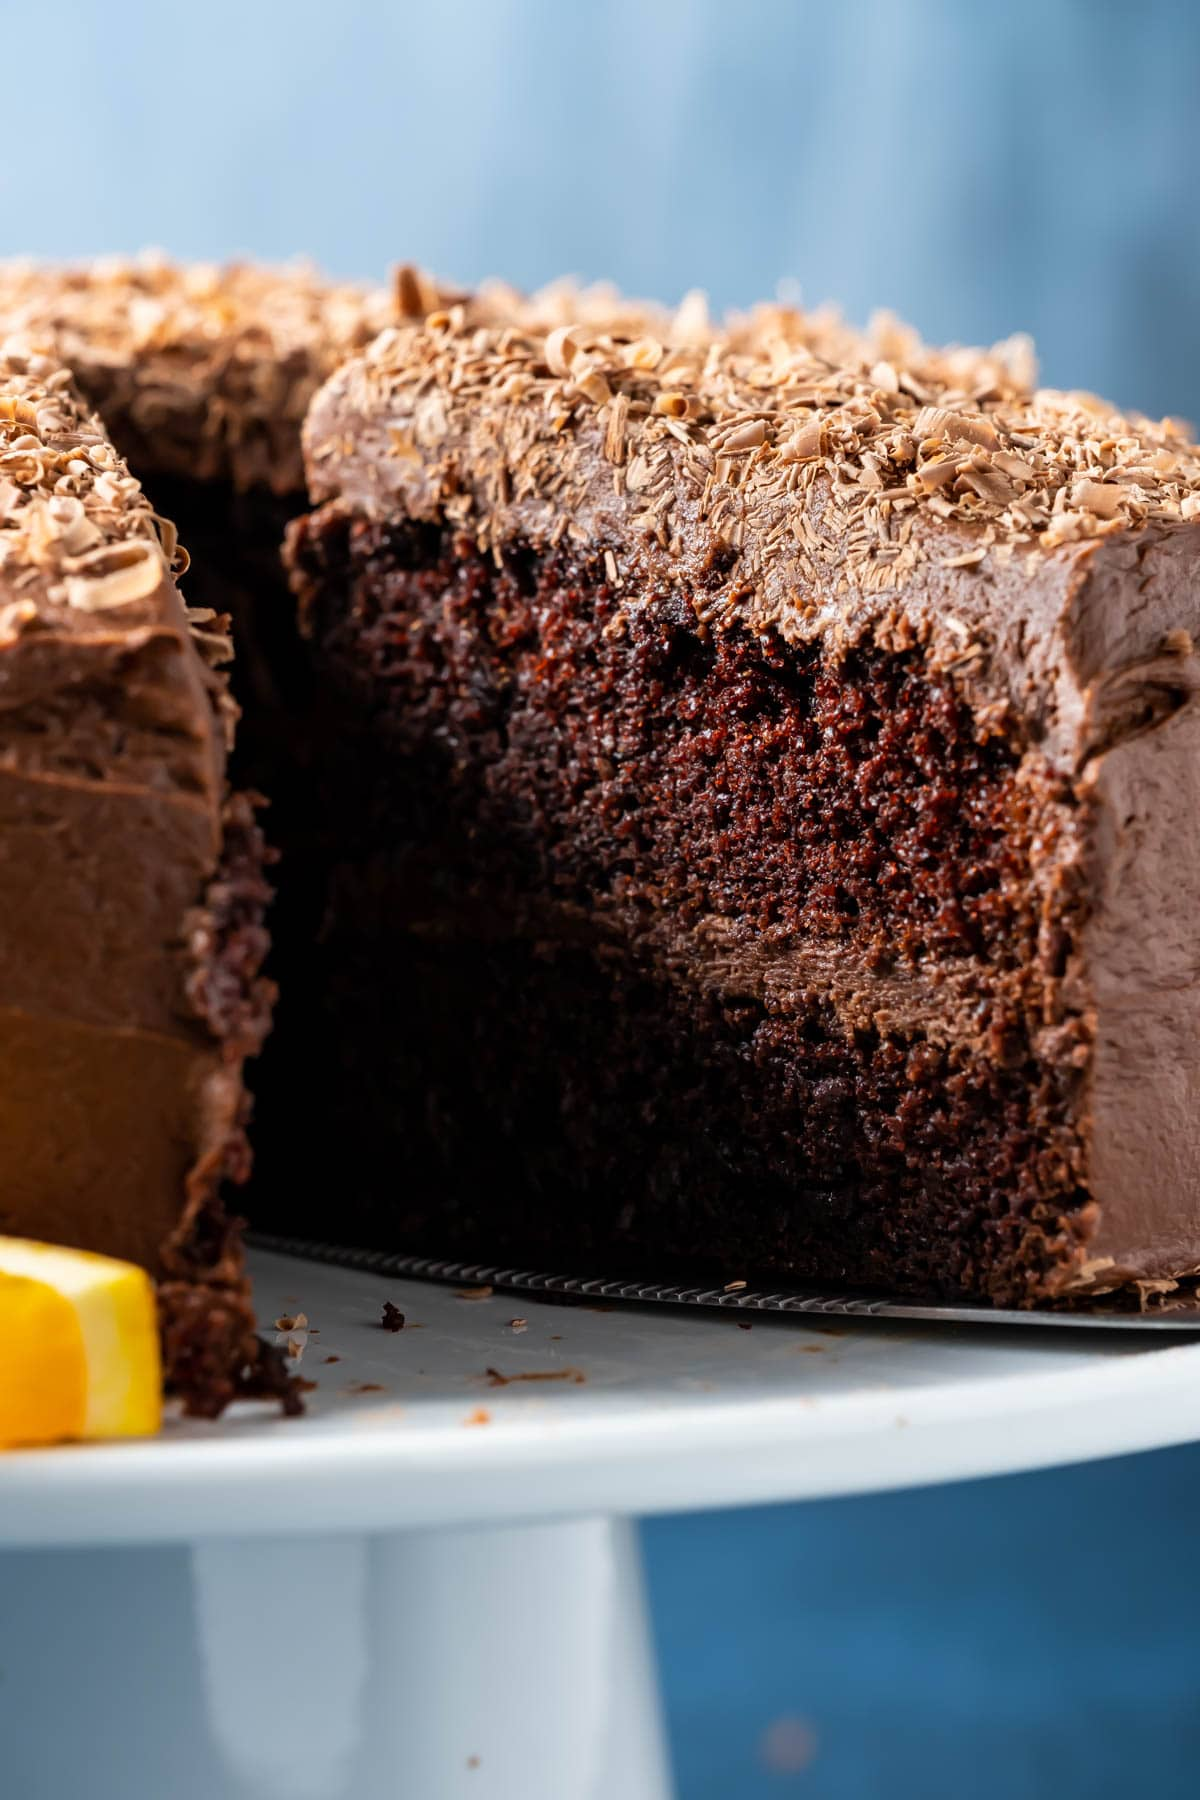 Sliced chocolate orange cake on a white cake stand.